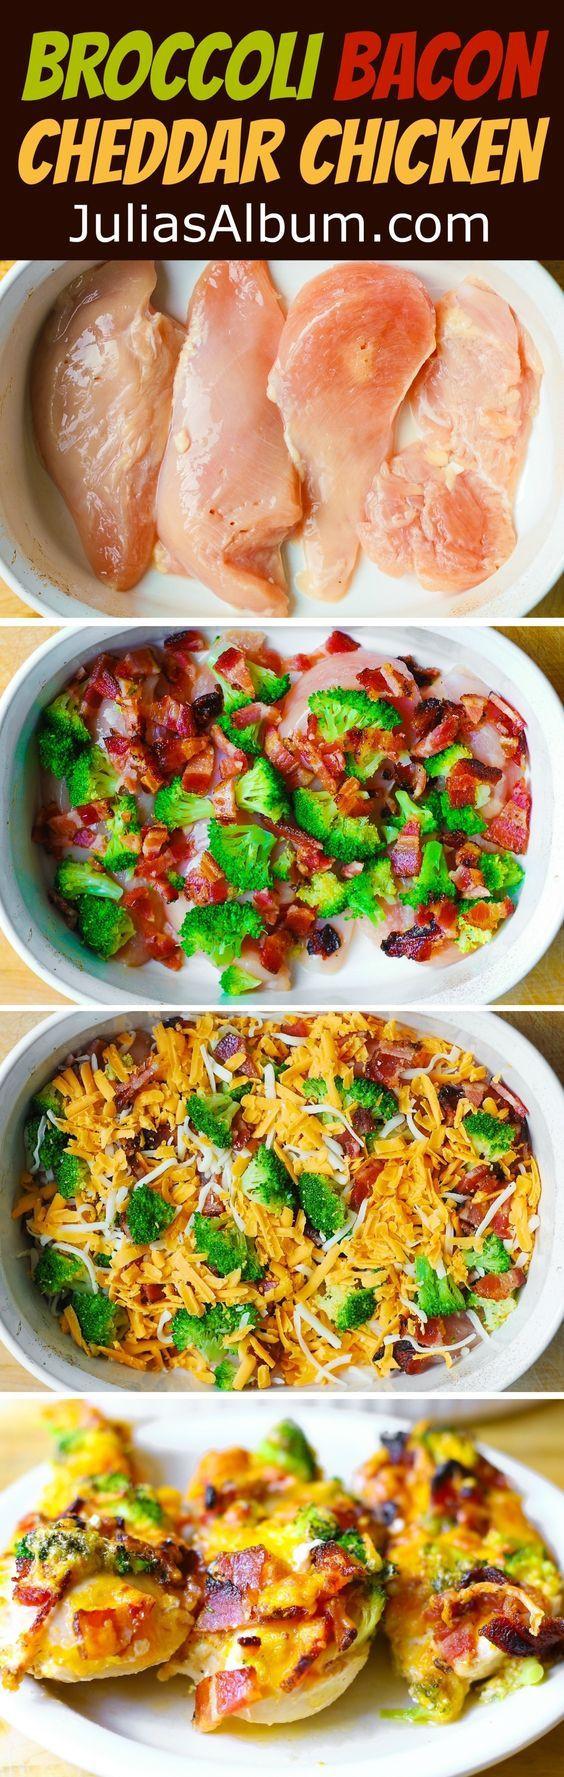 Diabetic Meal Recipes  Best 25 Diabetic meals ideas on Pinterest